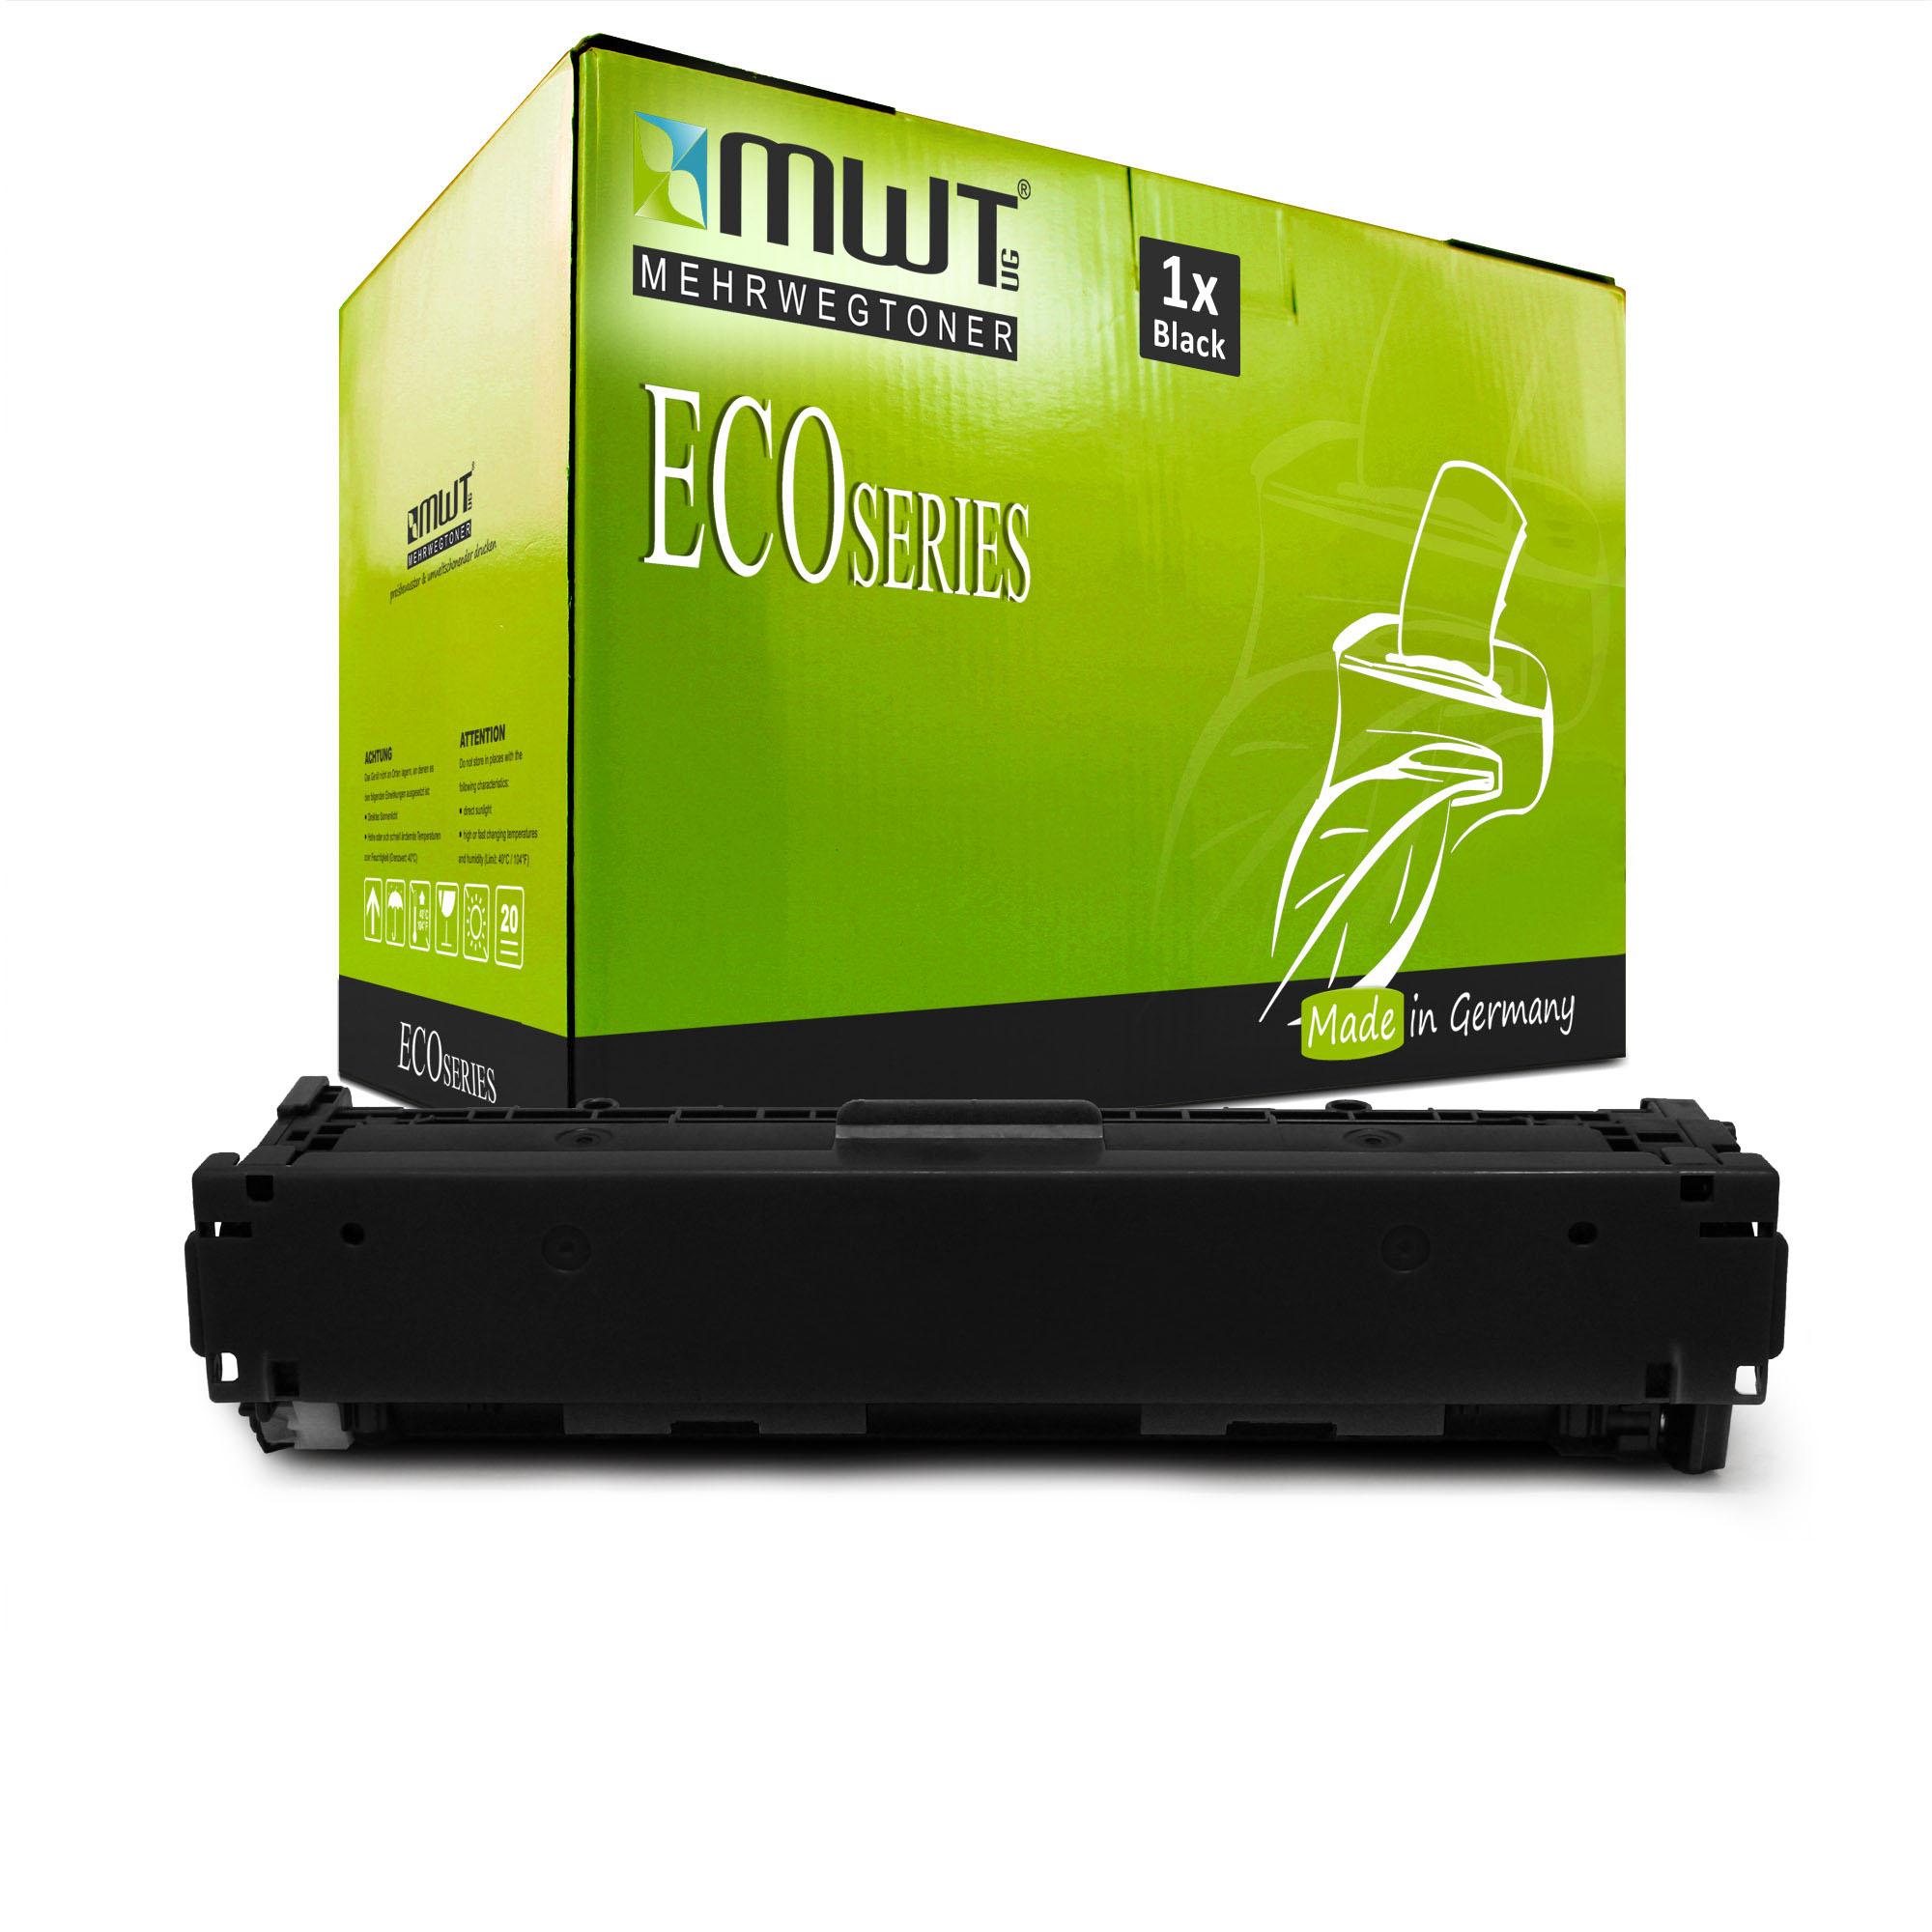 MWT ECO Patrone SCHWARZ für HP Color LaserJet Pro CP-1525-n CM-1415-fnw